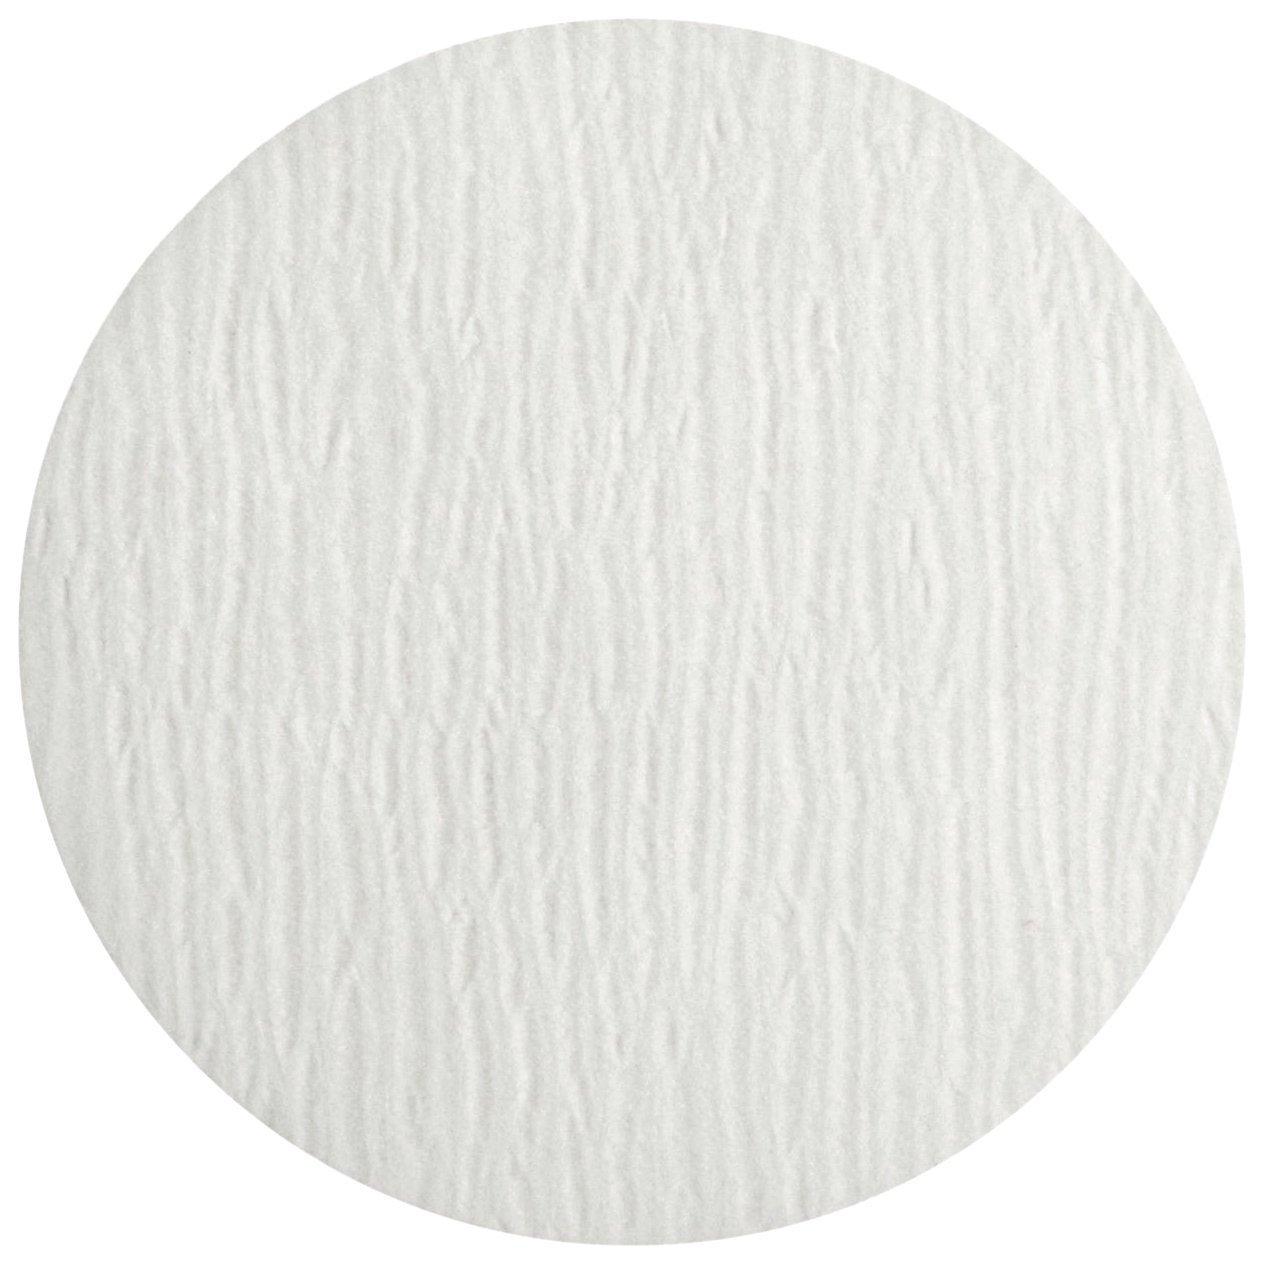 Whatman 1113-090 Quantitative Filter Paper Circles, 30 Micron, 1.3 s/100mL/sq inch Flow Rate, Grade 113, 90mm Diameter (Pack of 100)